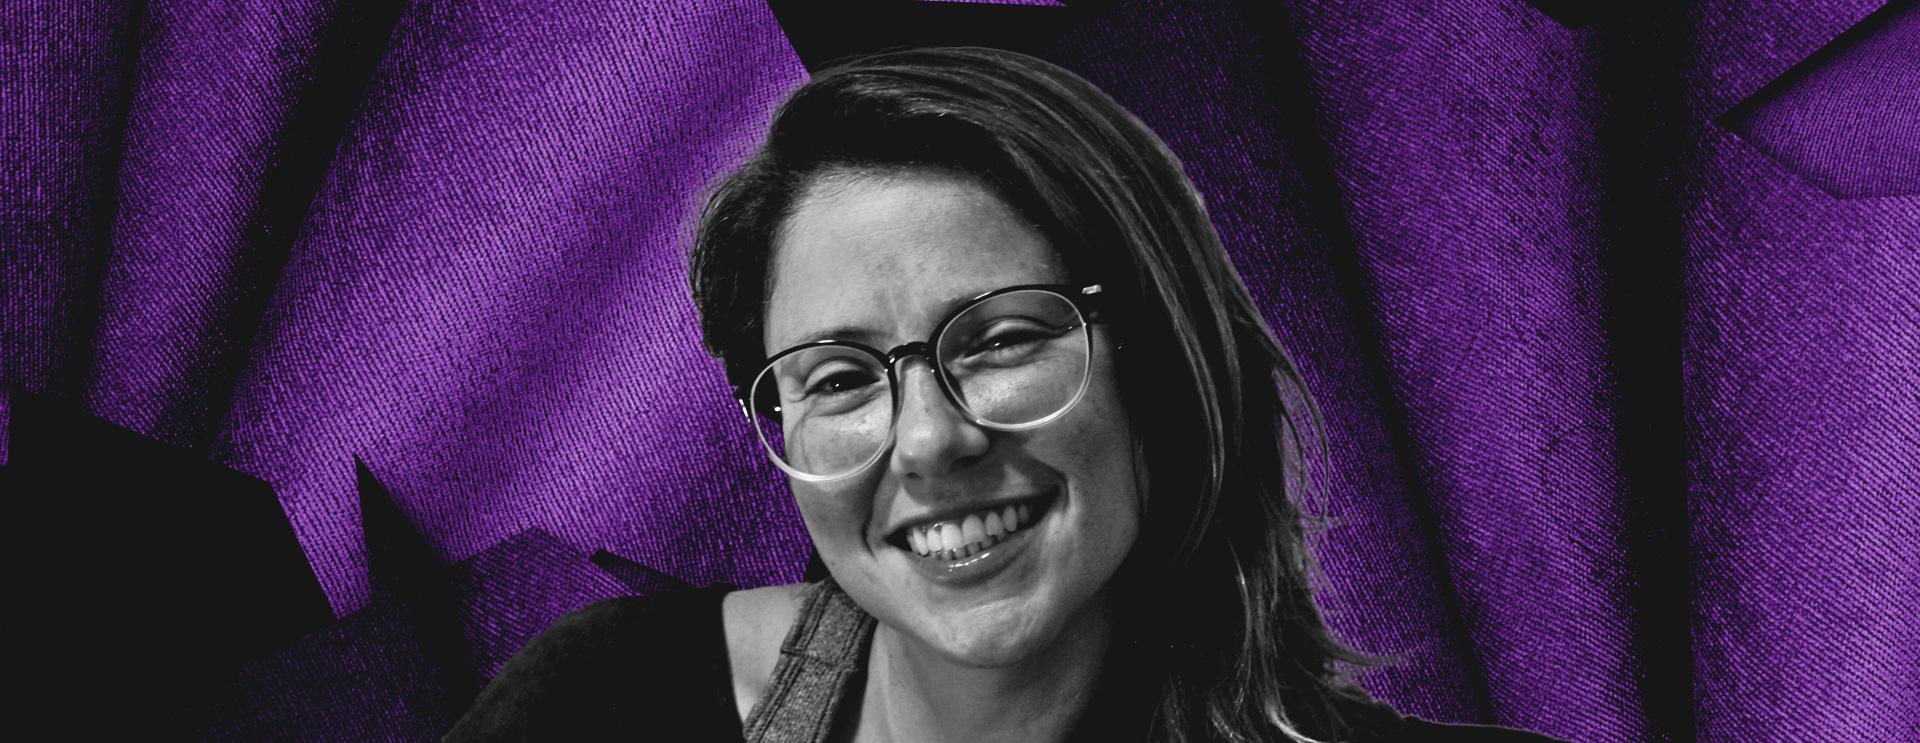 #ORGULHOTODODIA Roberta Santiago, vivendo a maternidade lésbica